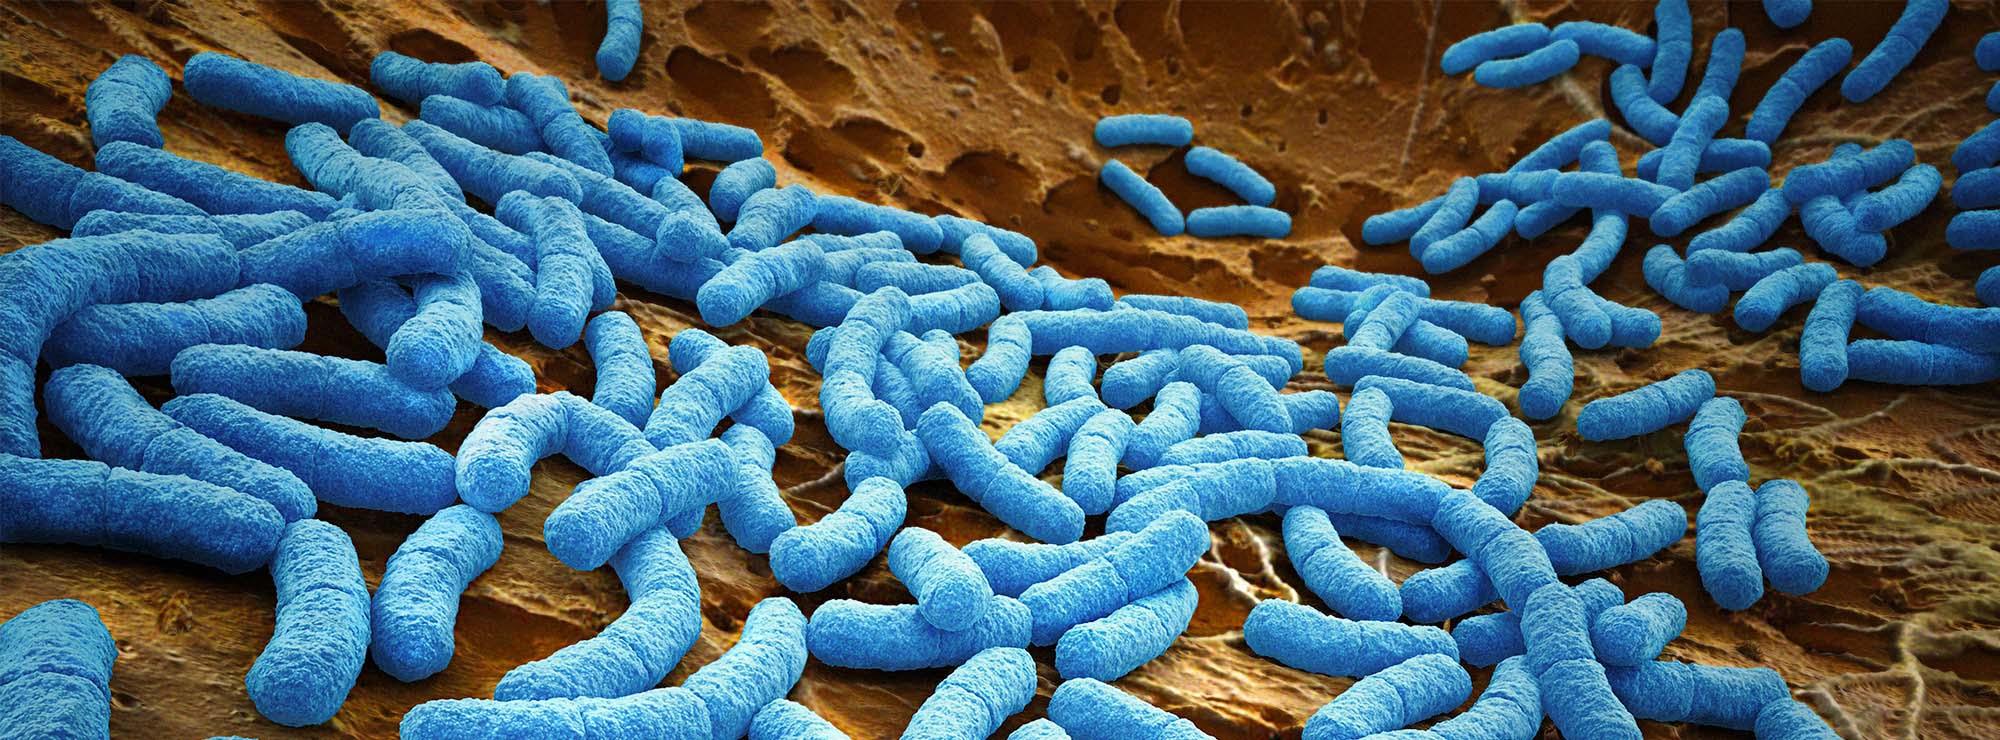 Scientists turn CRISPR into a genetic chainsaw to solve the antibiotics crisis – Fanatical Futurist by International Keynote Speaker Matthew Griffin